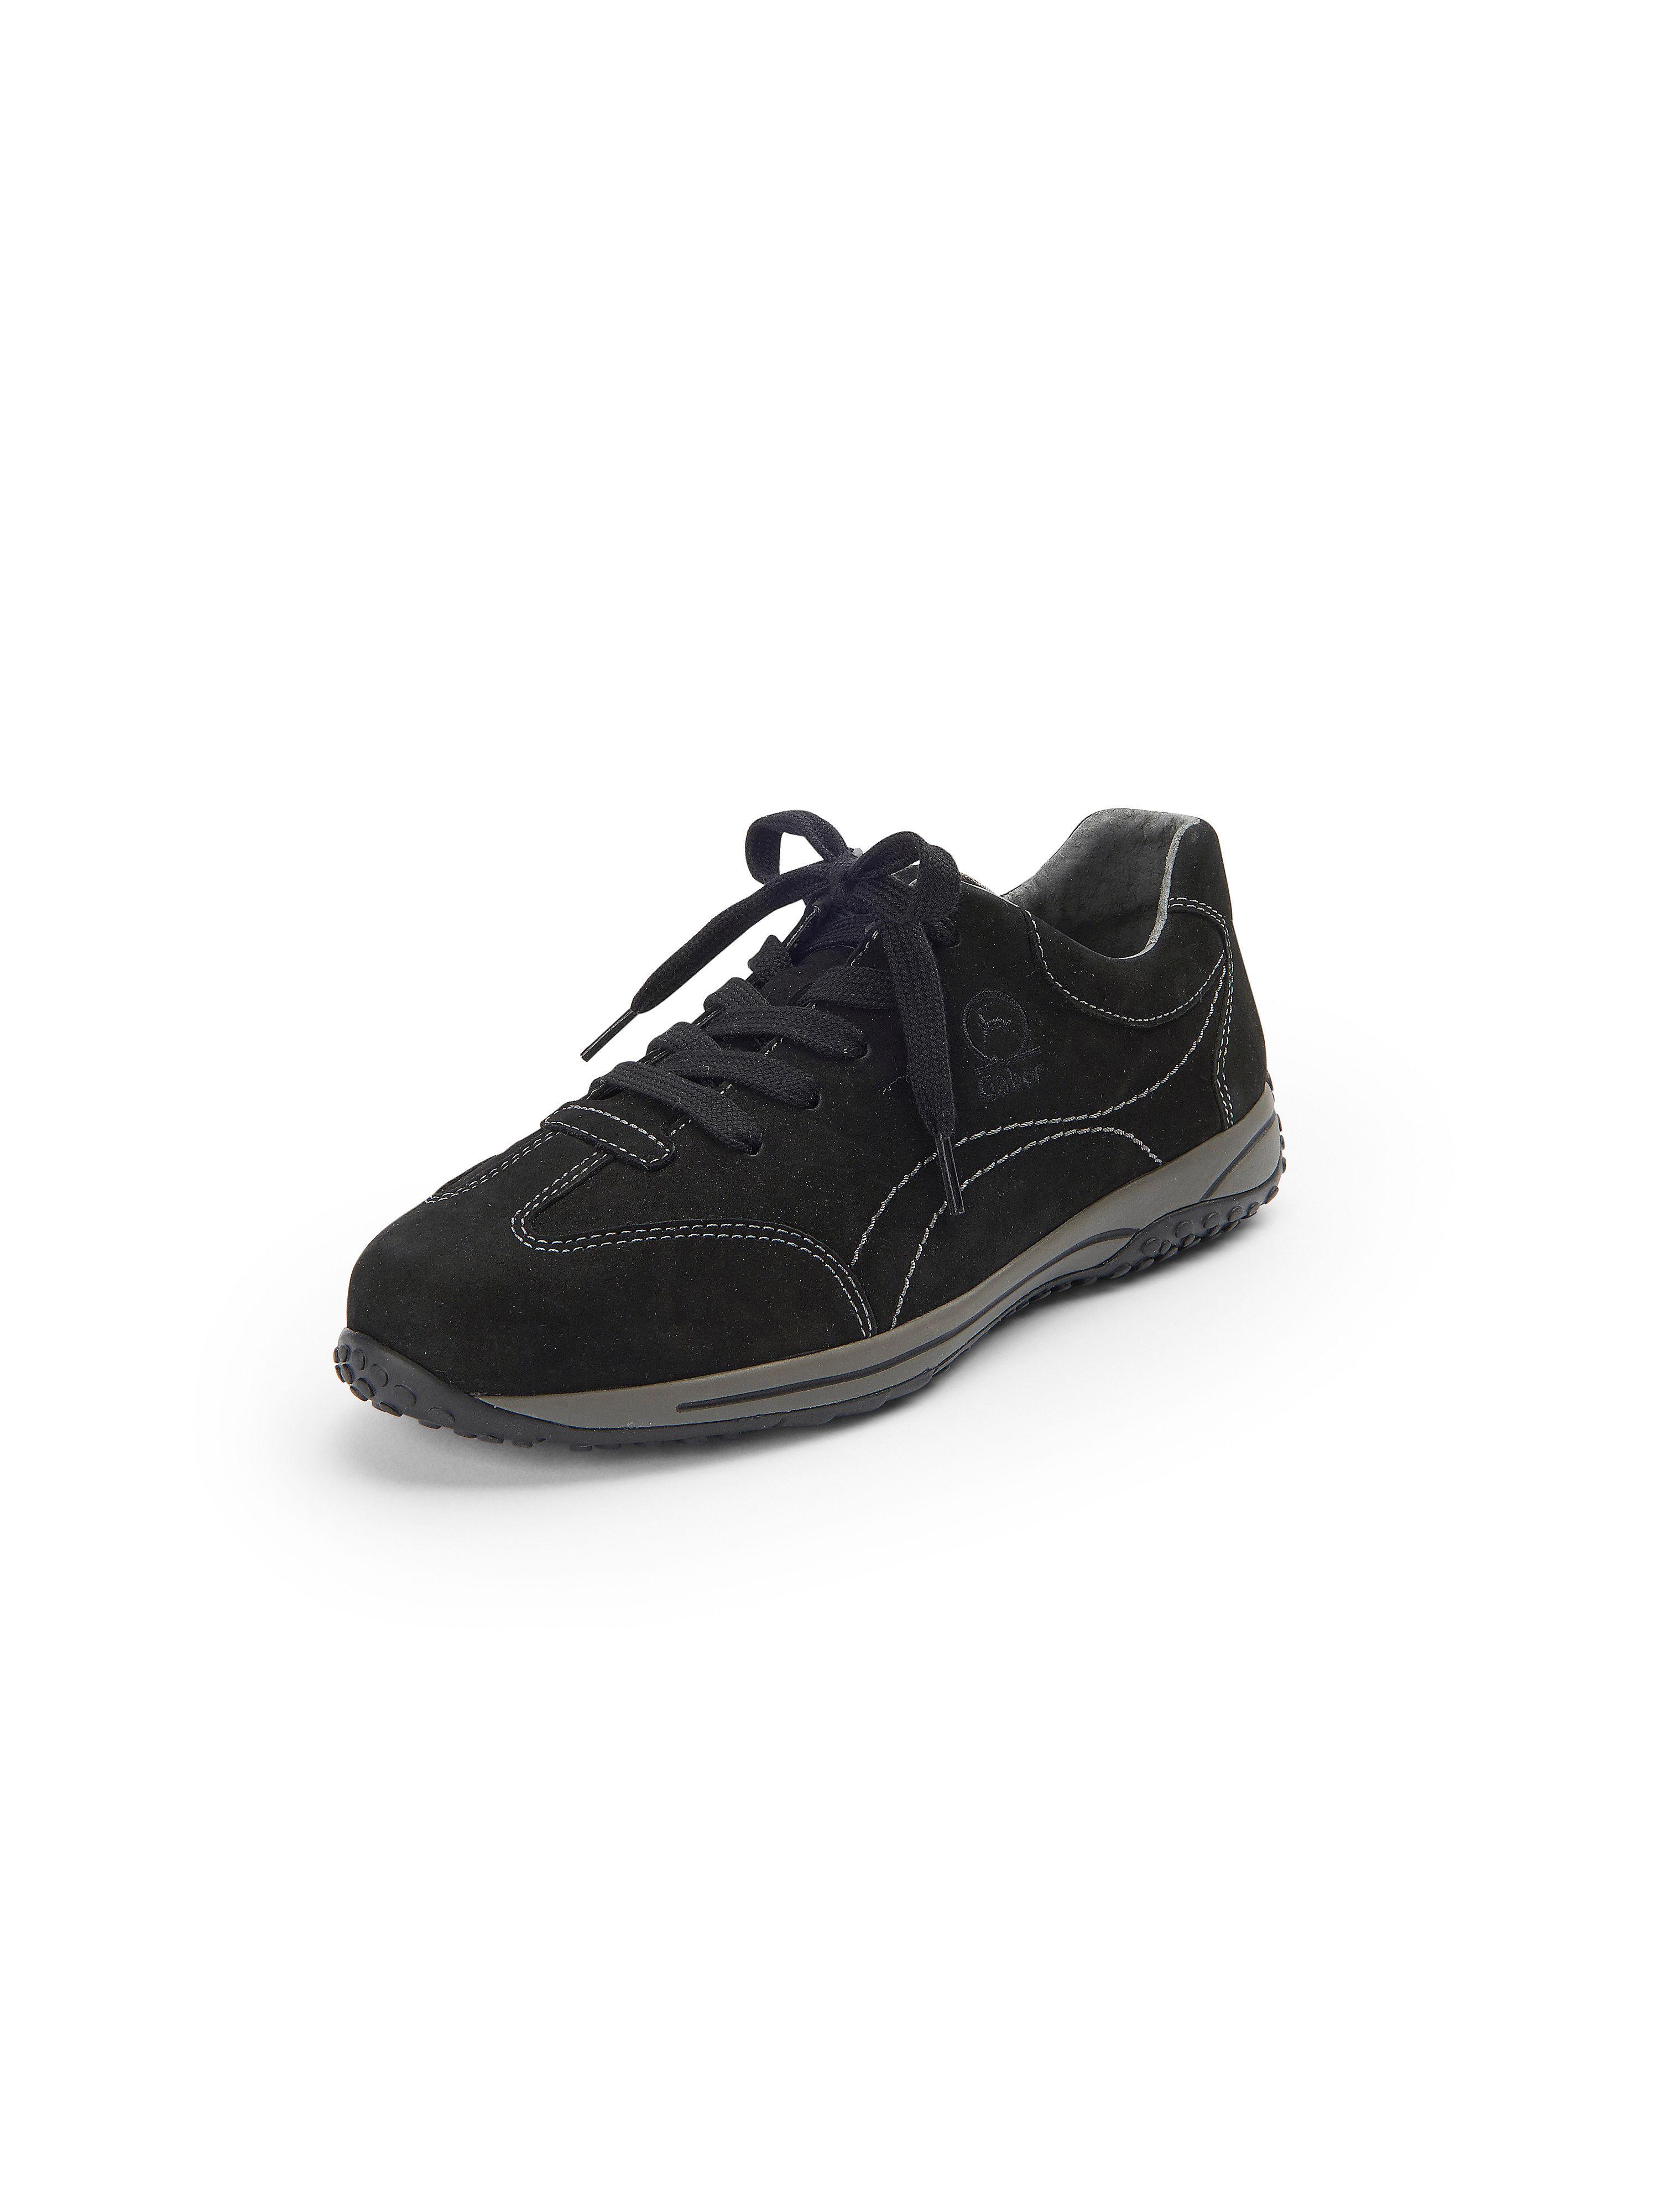 Image of   Sneakers Fra Gabor sort